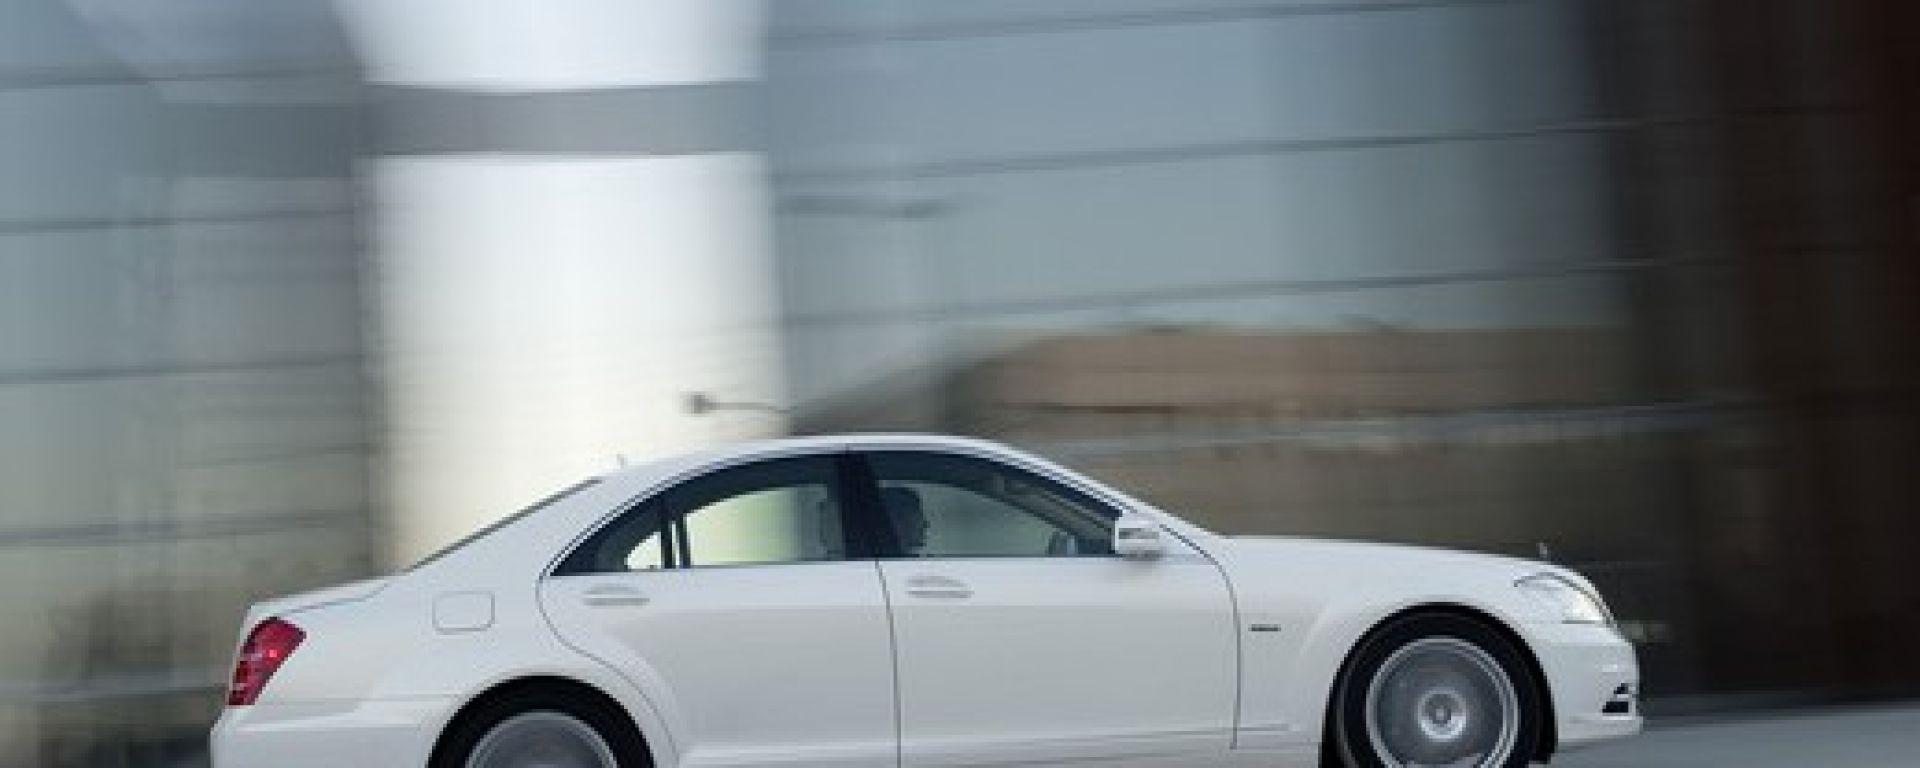 Mercedes Classe S 2009